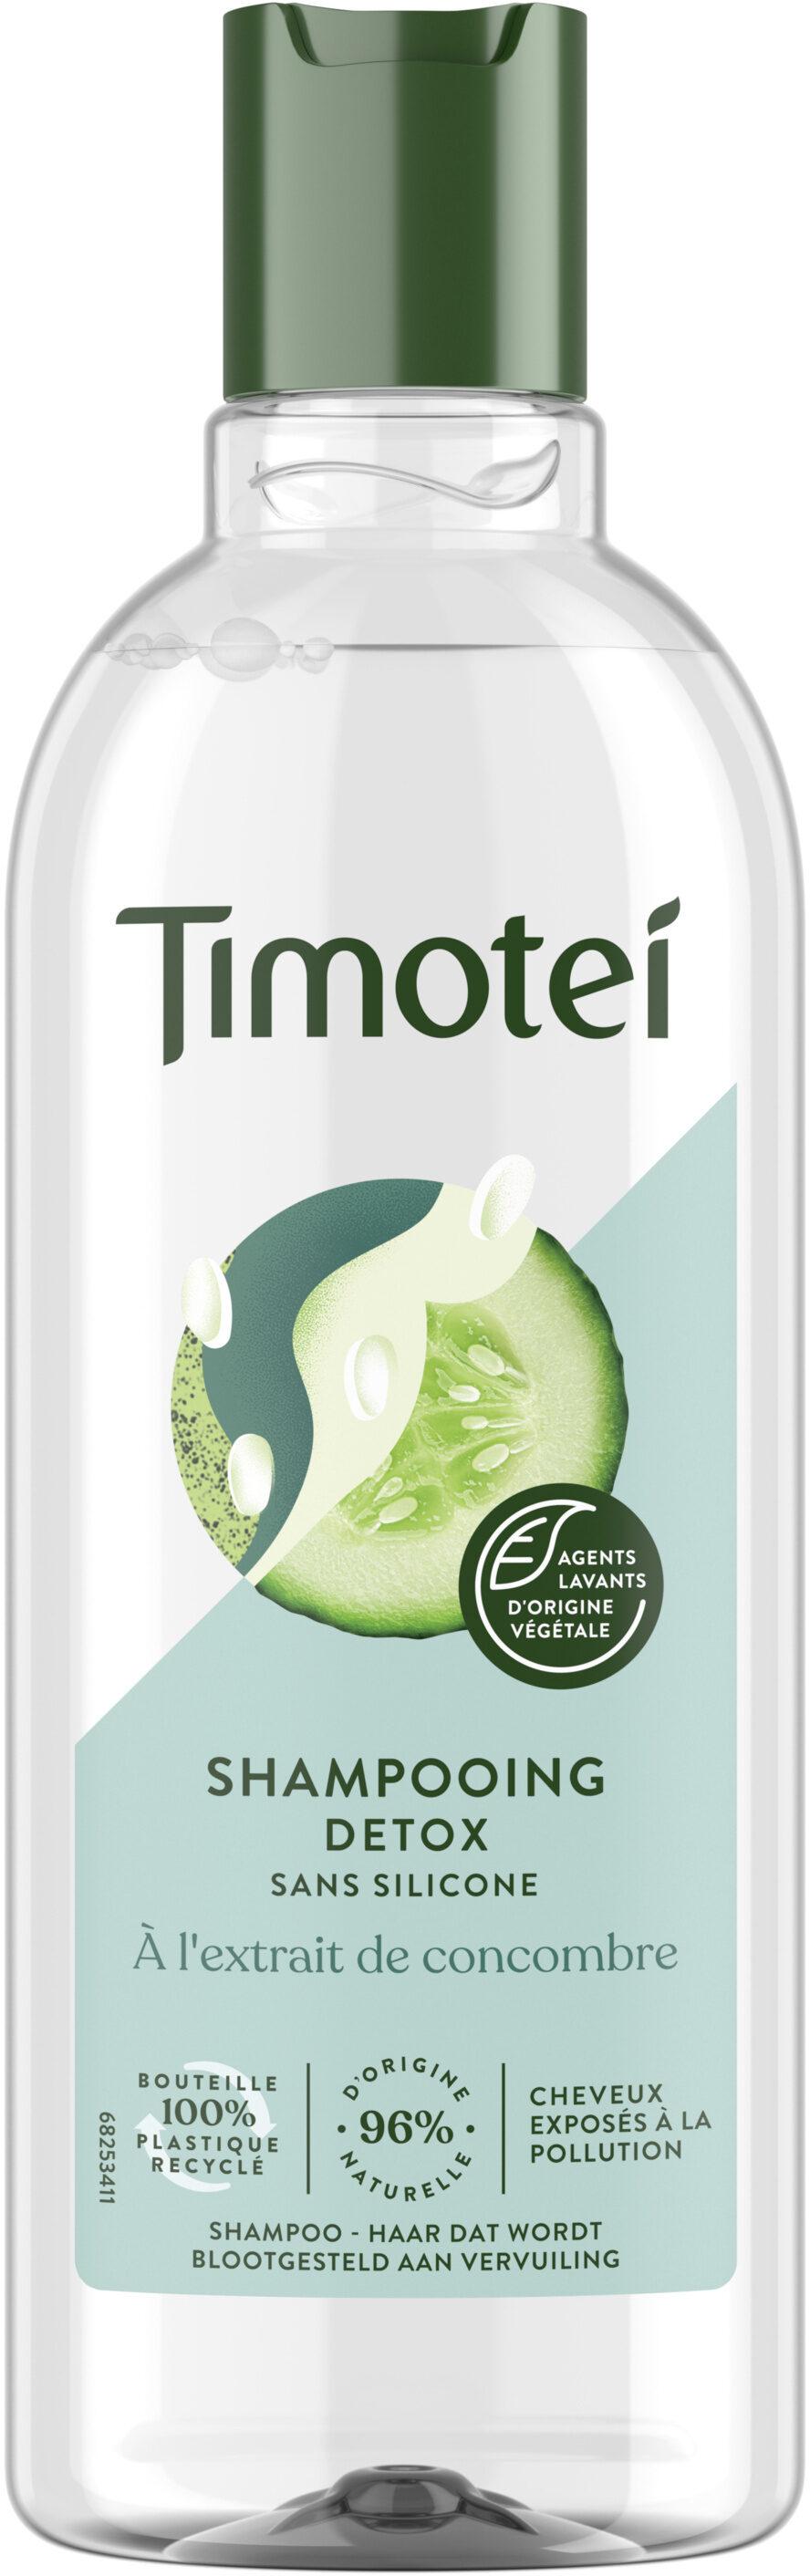 Timotei Shampooing Femme Detox - Produit - fr